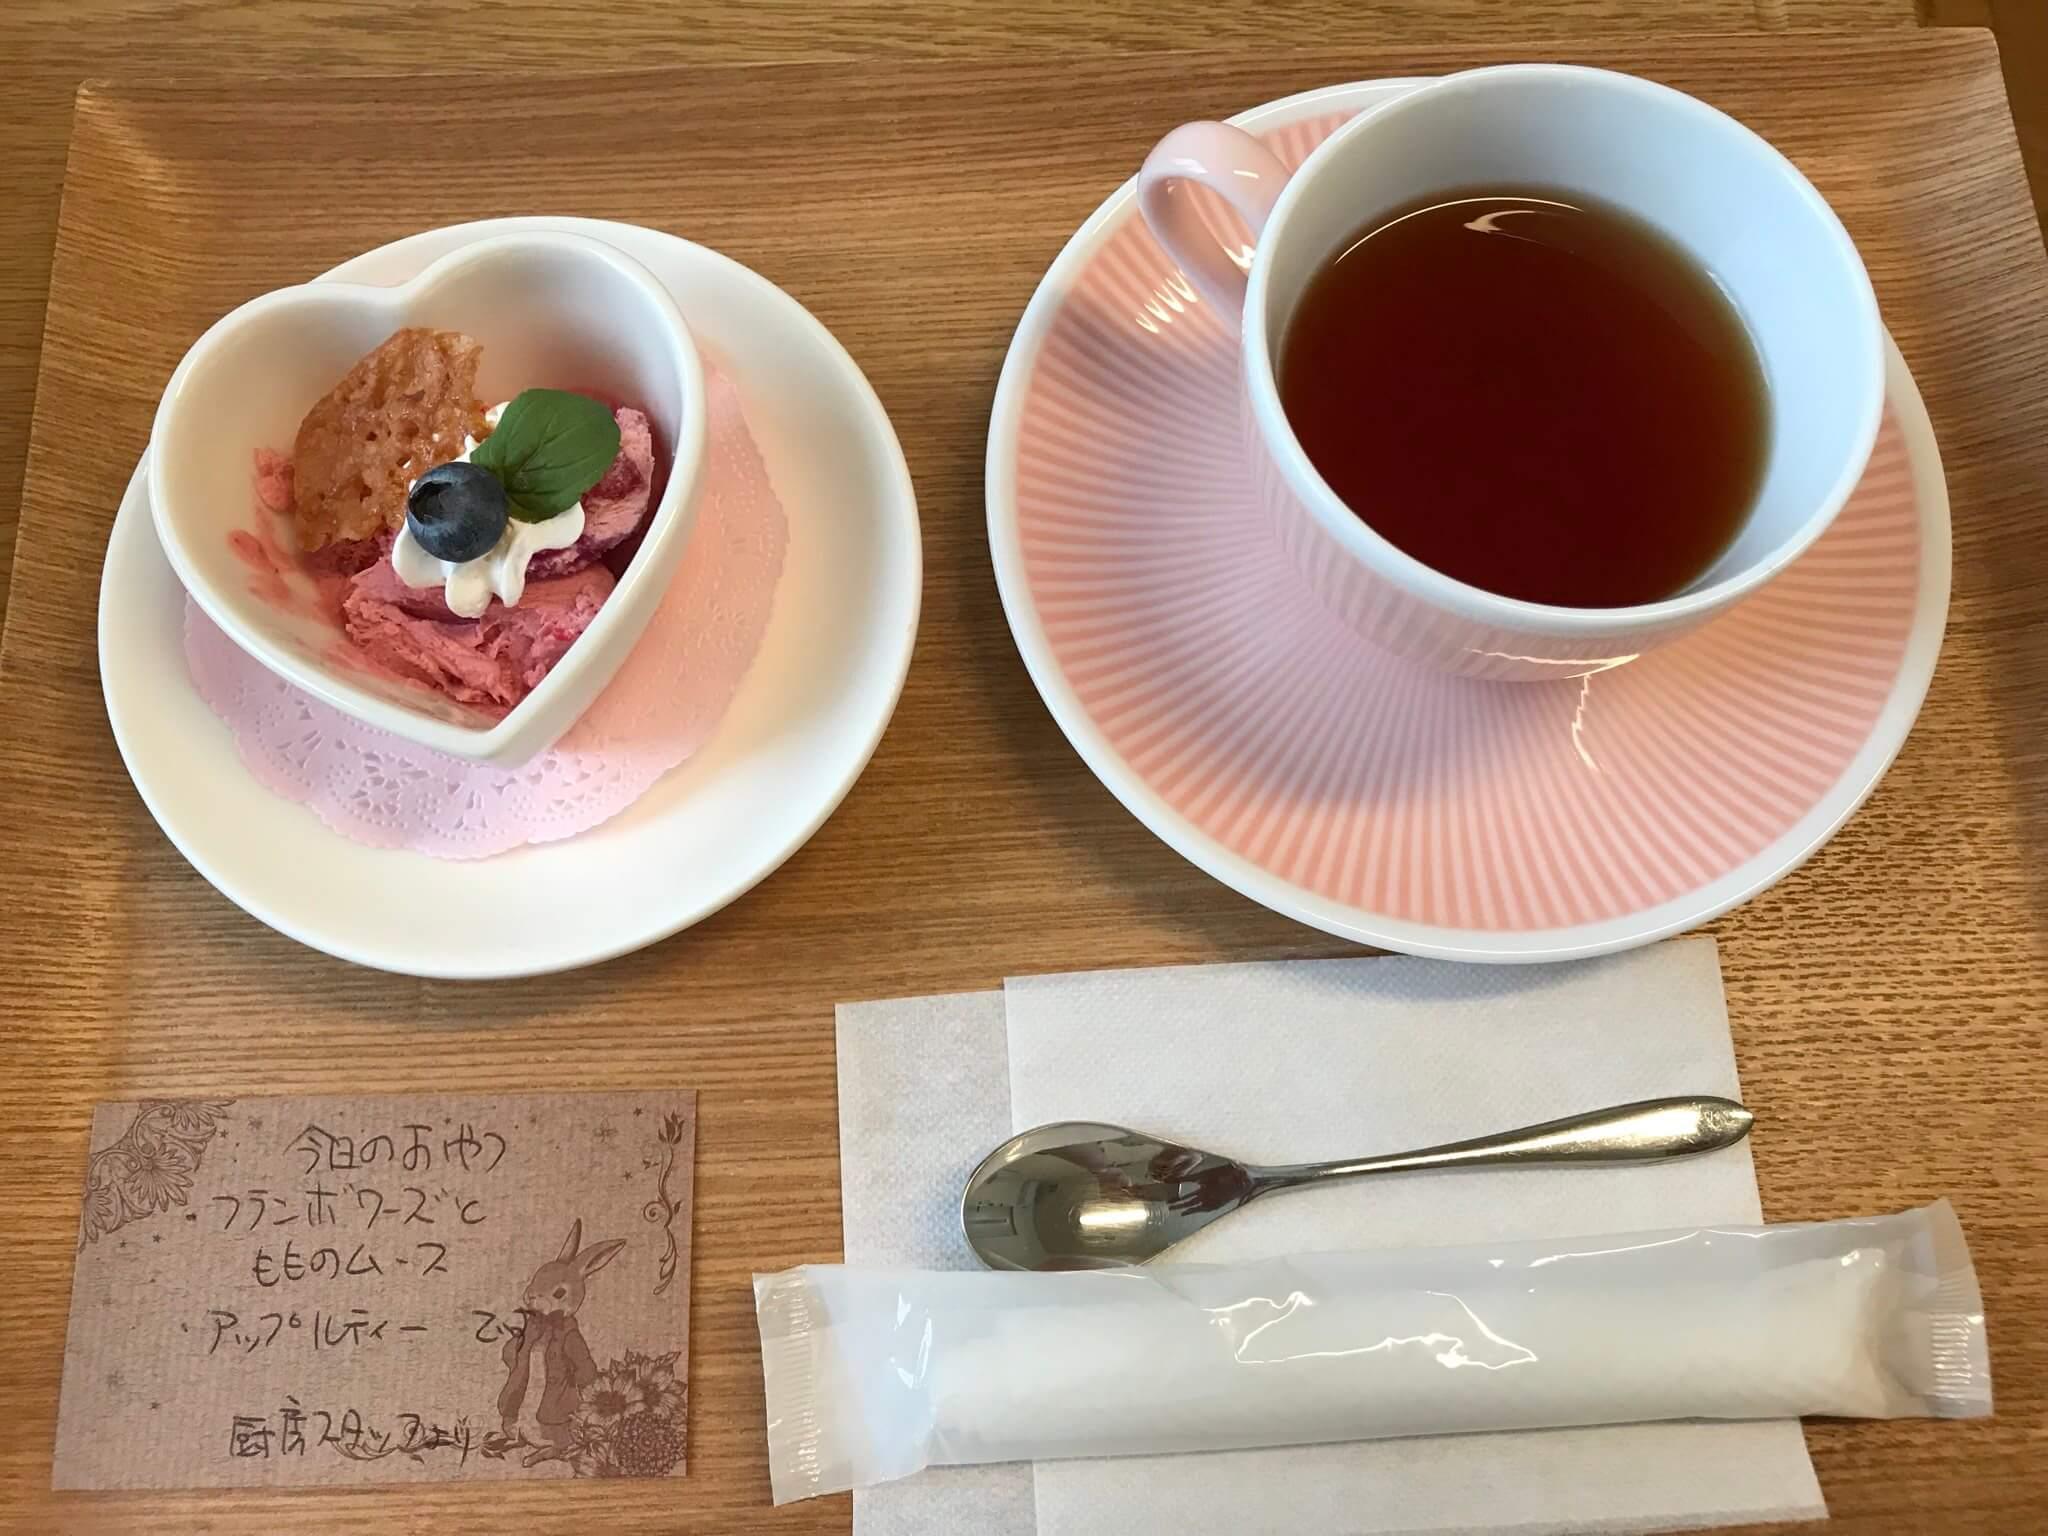 Japanese hospital meals 11 (1)